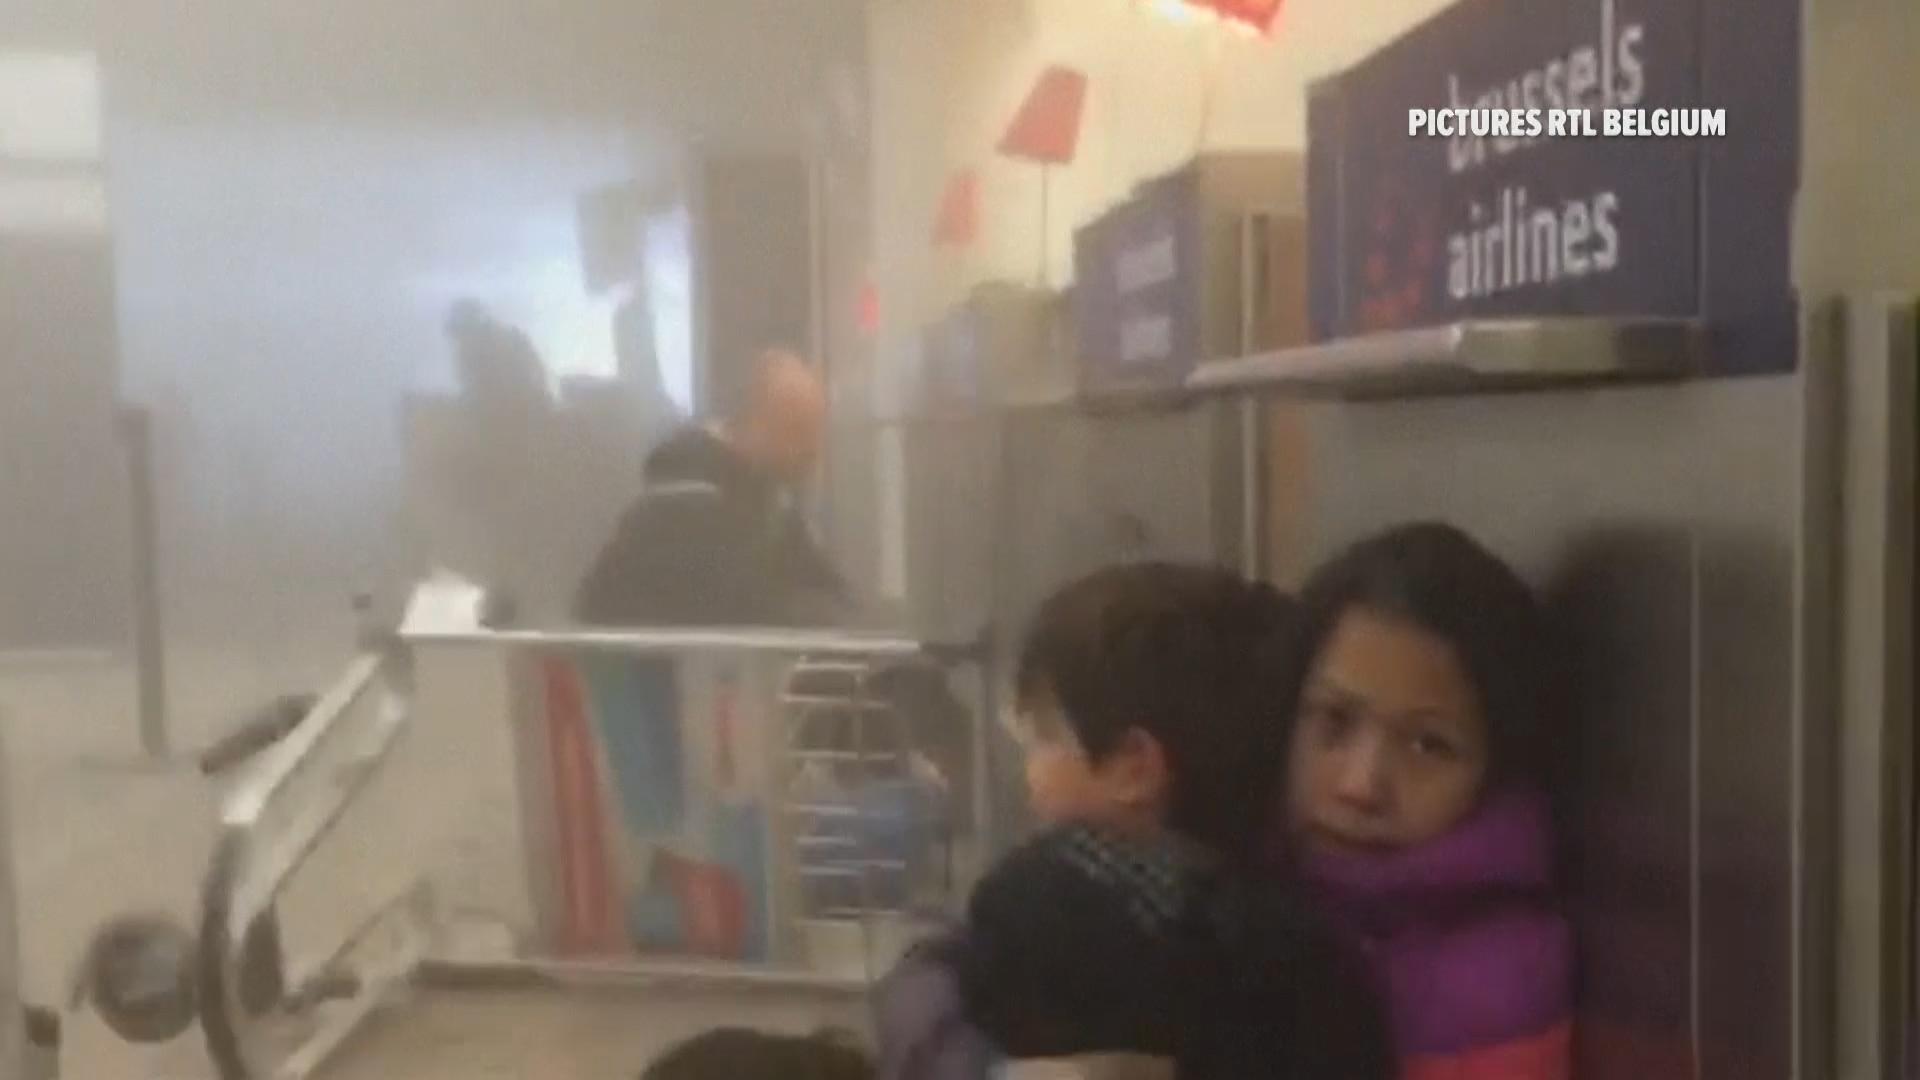 Vídeo mostra vítimas presas no aeroporto após ataques em Bruxelas